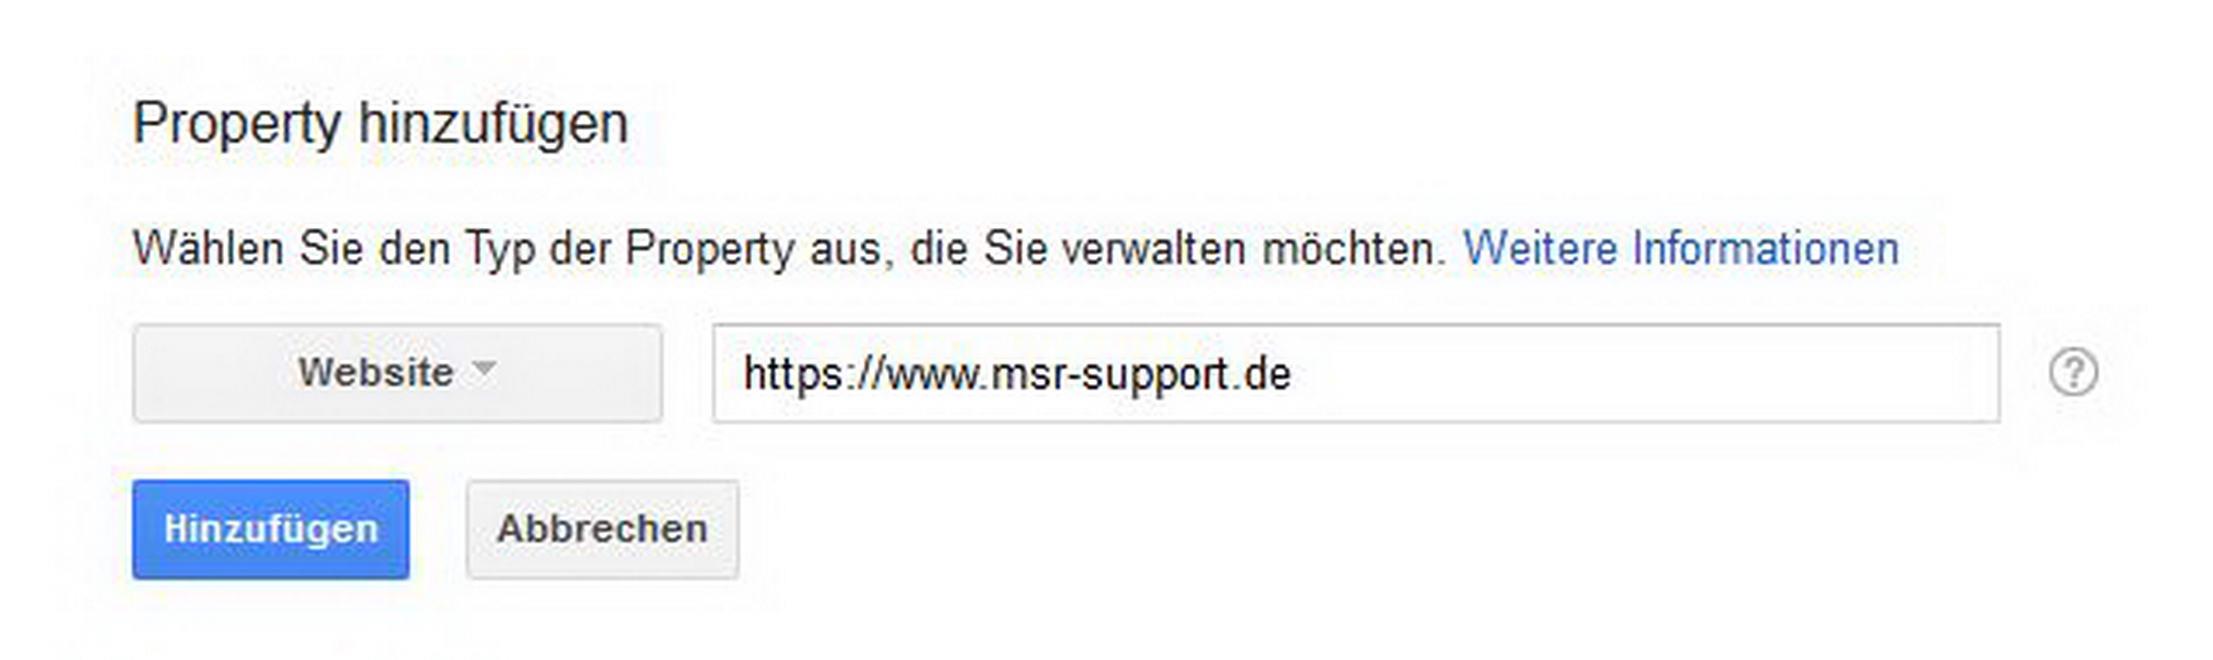 Neue URL in Search Console anlegen